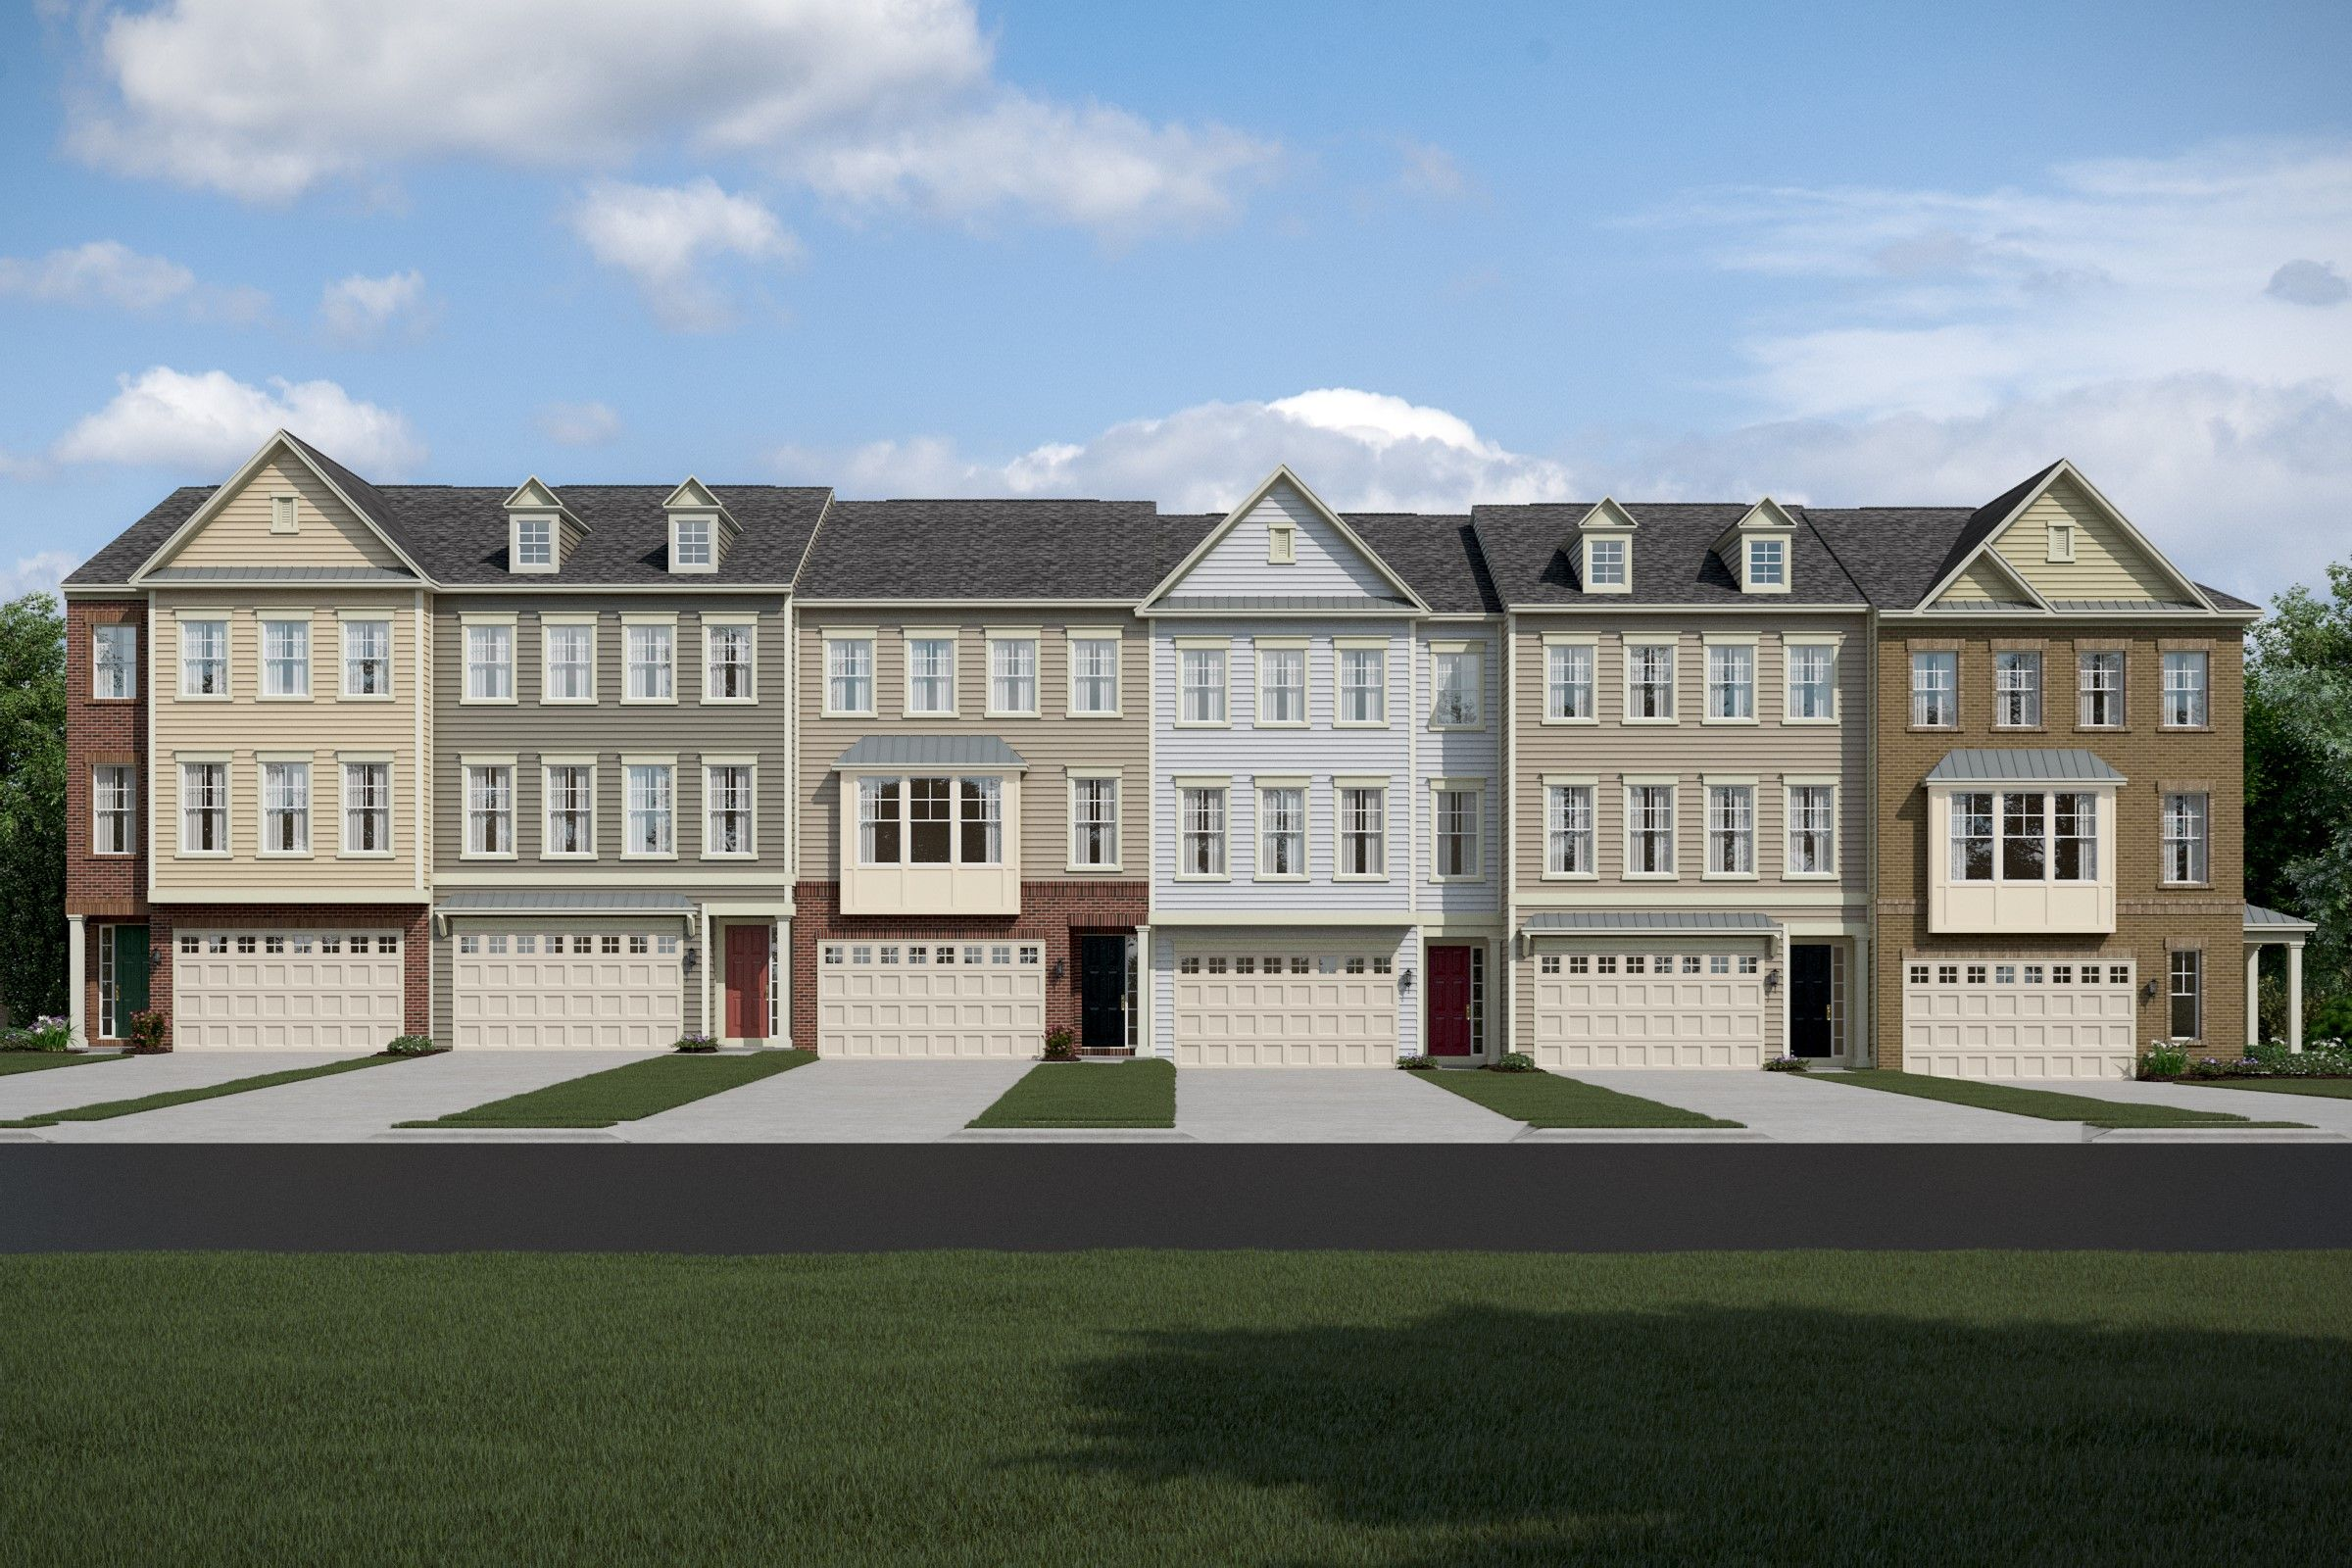 17 Enclave Court, Homesite 27, Annapolis, MD Homes & Land - Real Estate